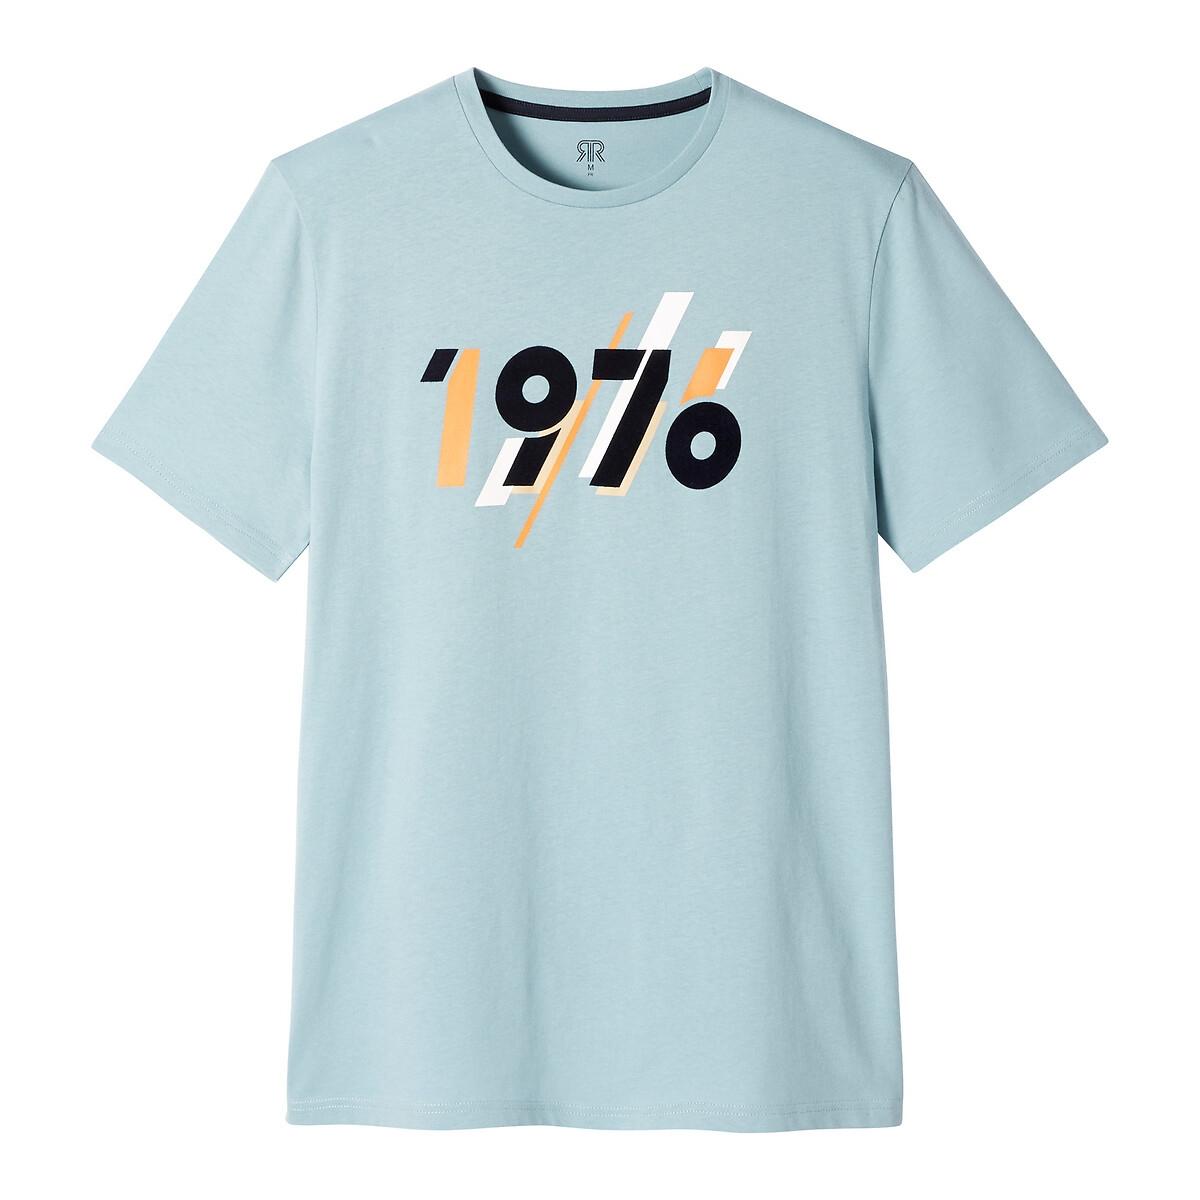 T-shirt de gola redonda, mangas curtas, motivo 1970